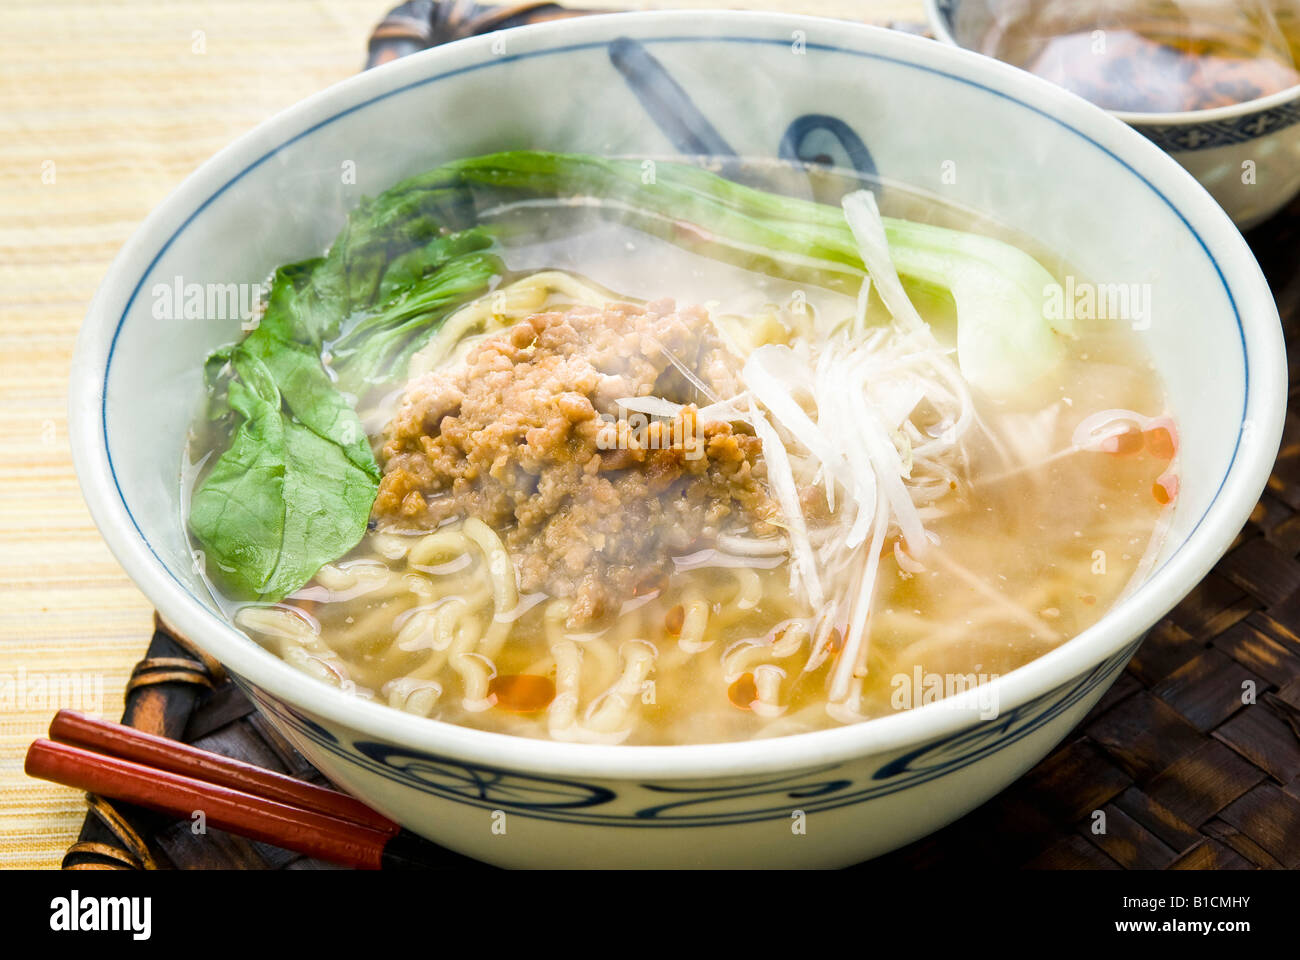 Tan Tan noodles Stock Photo, Royalty Free Image: 18104631 ...